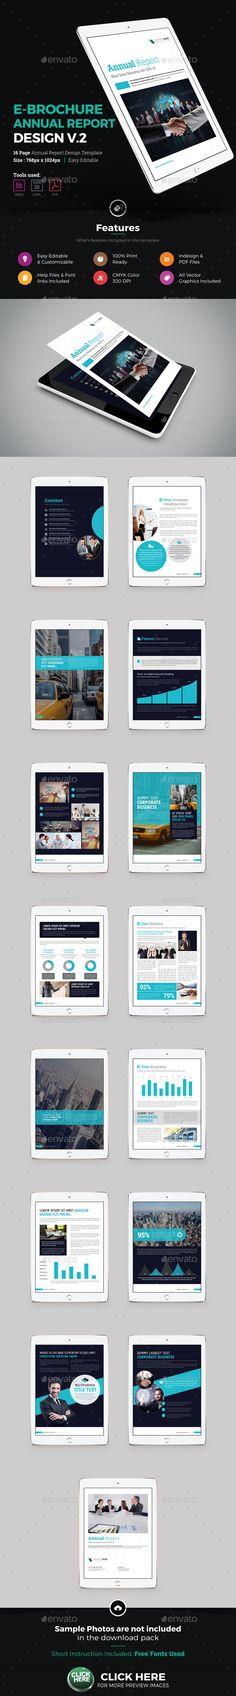 Technology Brochure Catalog Template v3 Brochures, Catalog and - technology brochure template